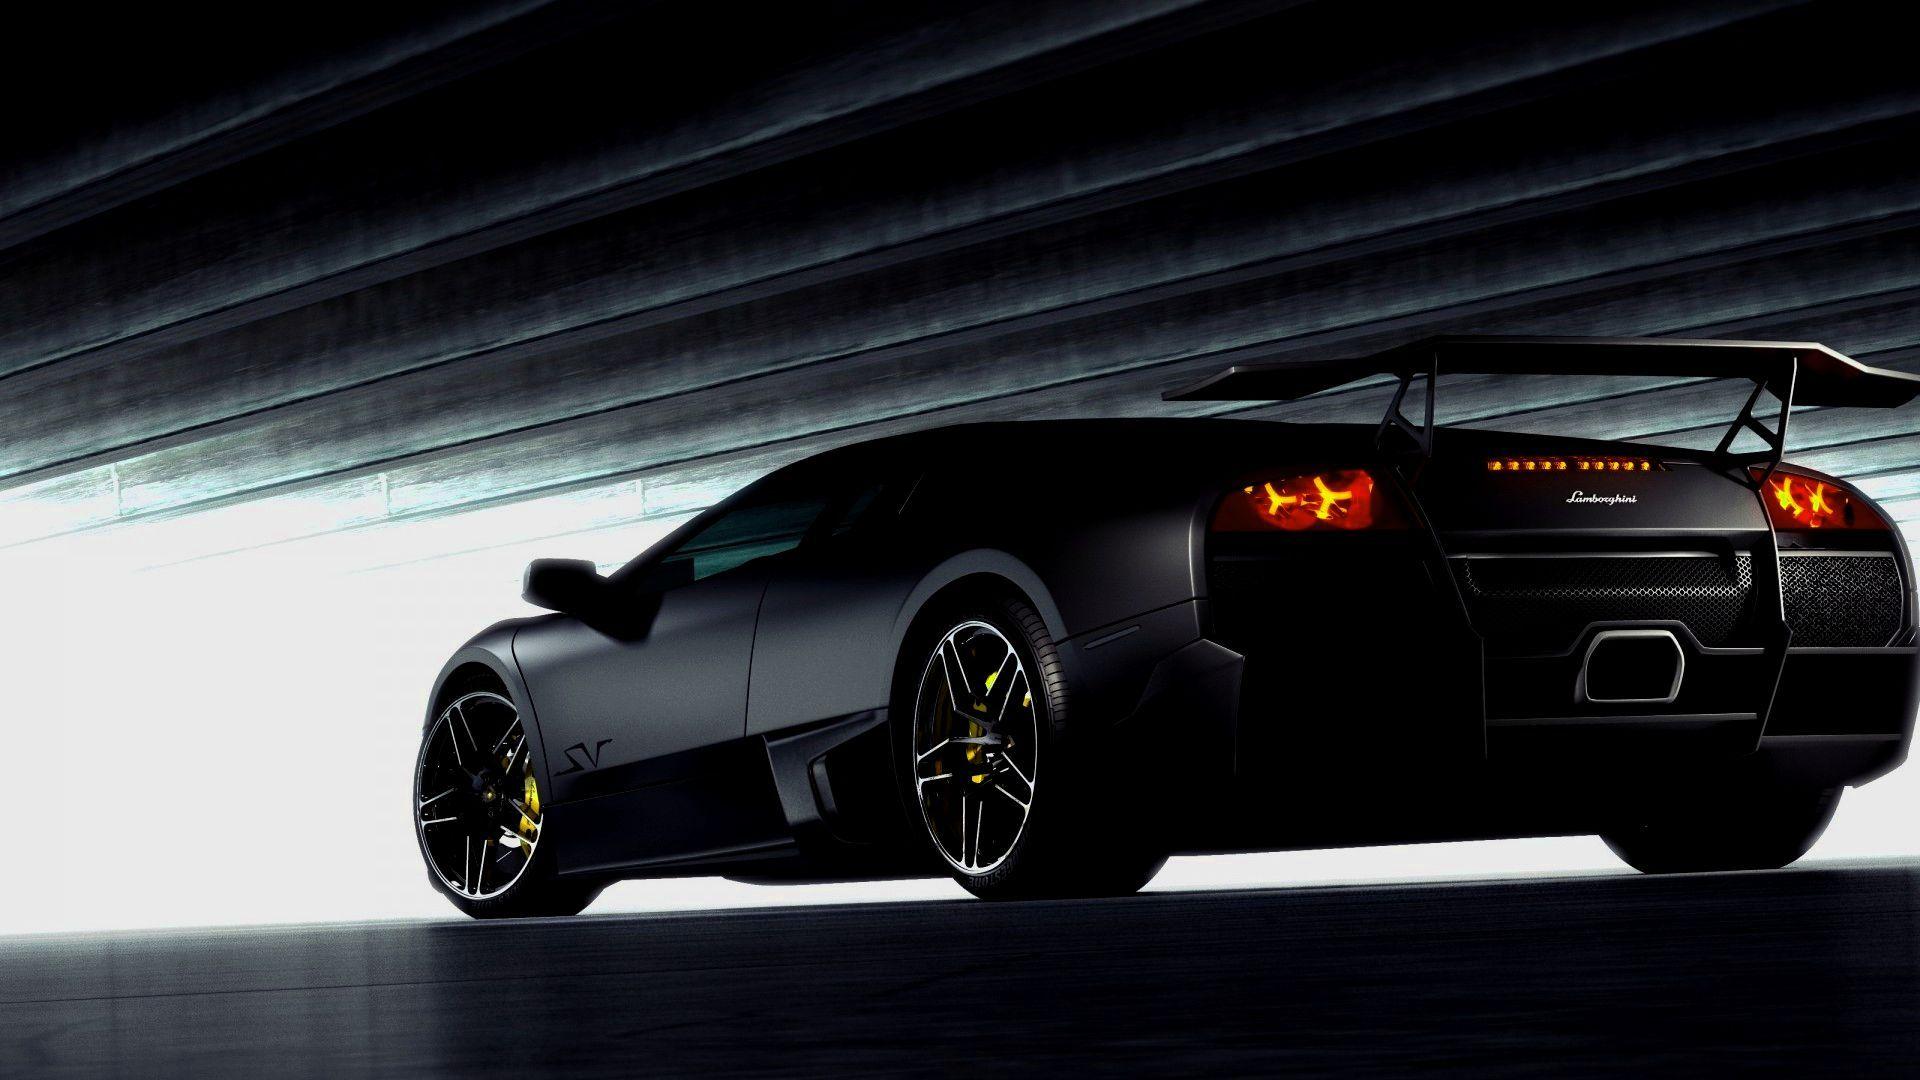 1080p Wallpapers Cars Dengan Gambar Lamborghini